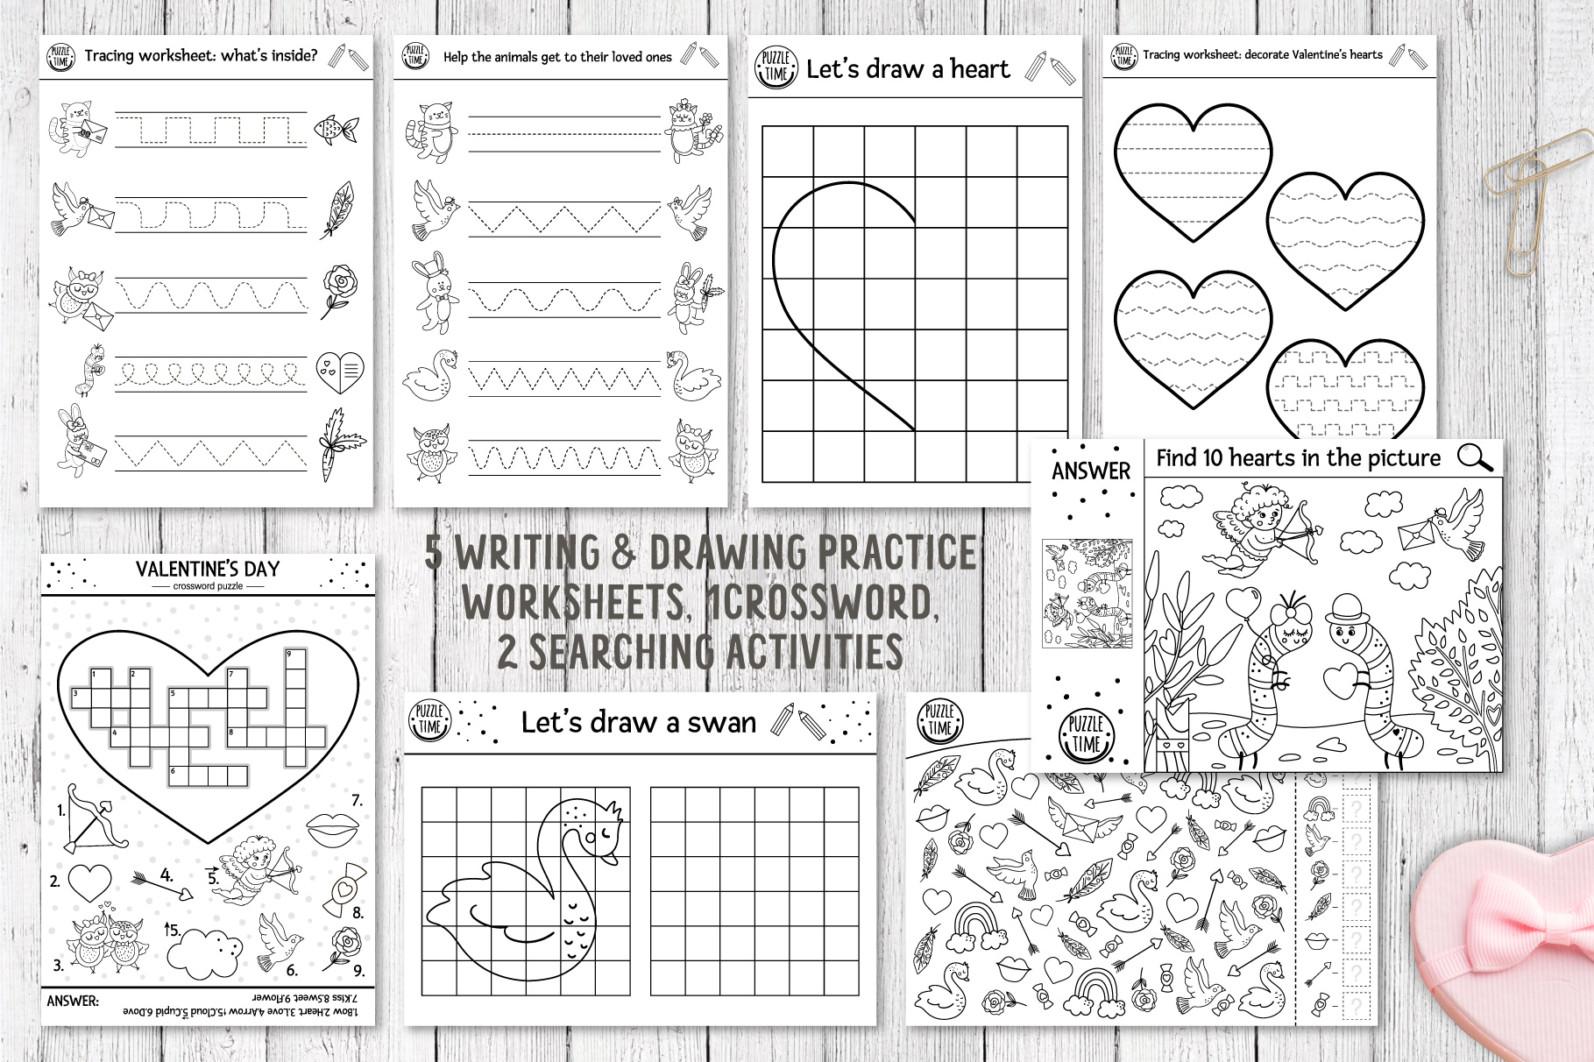 Saint Valentine's Coloring Games - 7 16 -